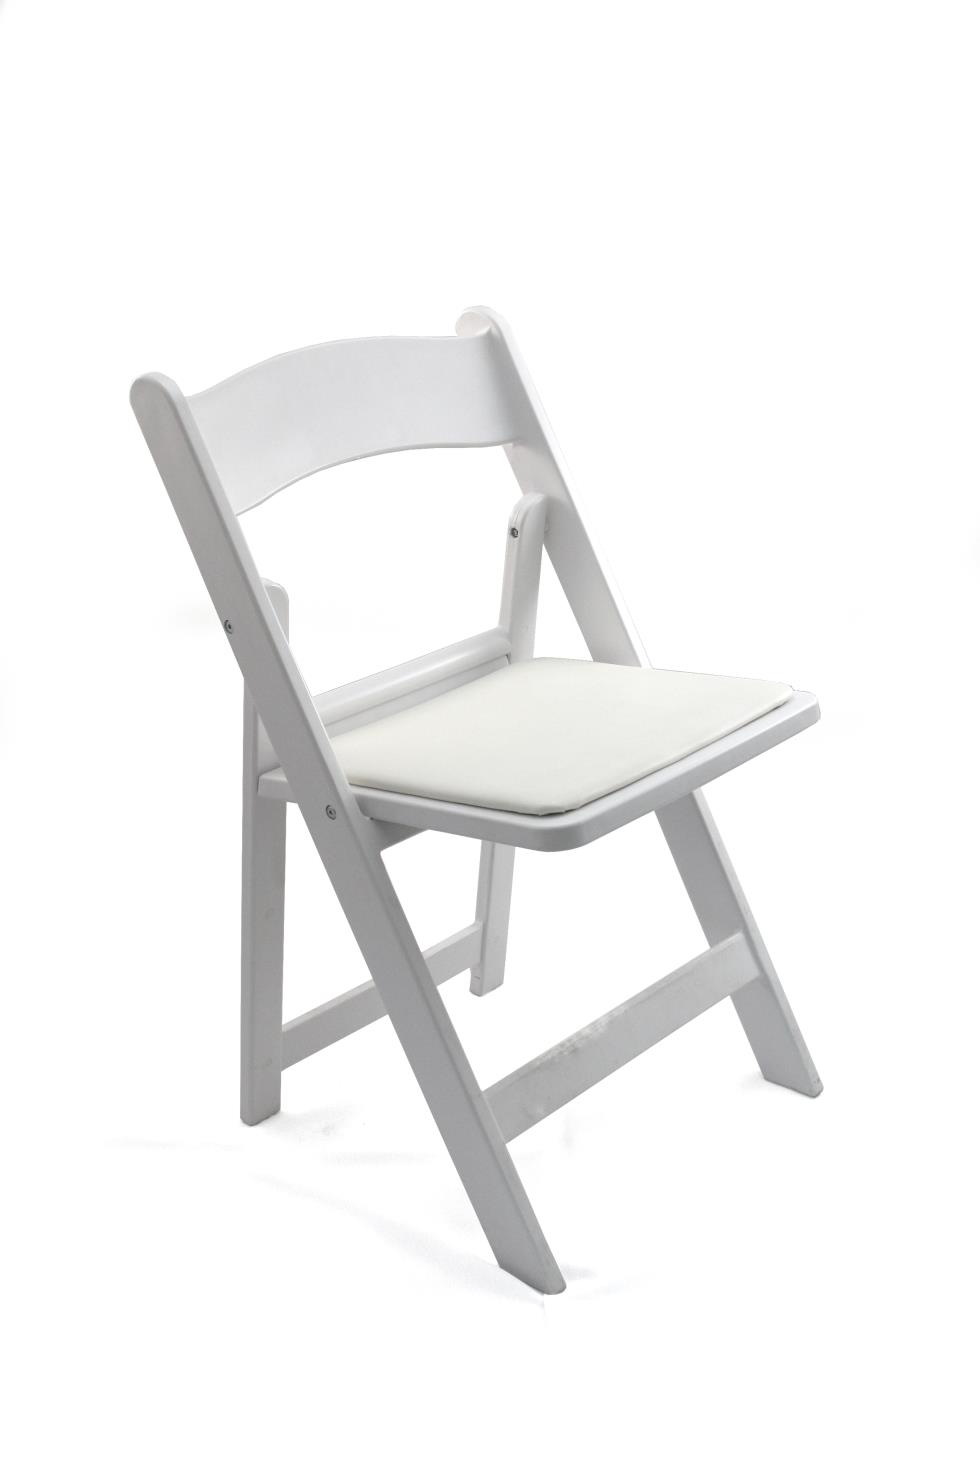 Surprising Butler Rents White Resin Folding Chair Rentals Creativecarmelina Interior Chair Design Creativecarmelinacom